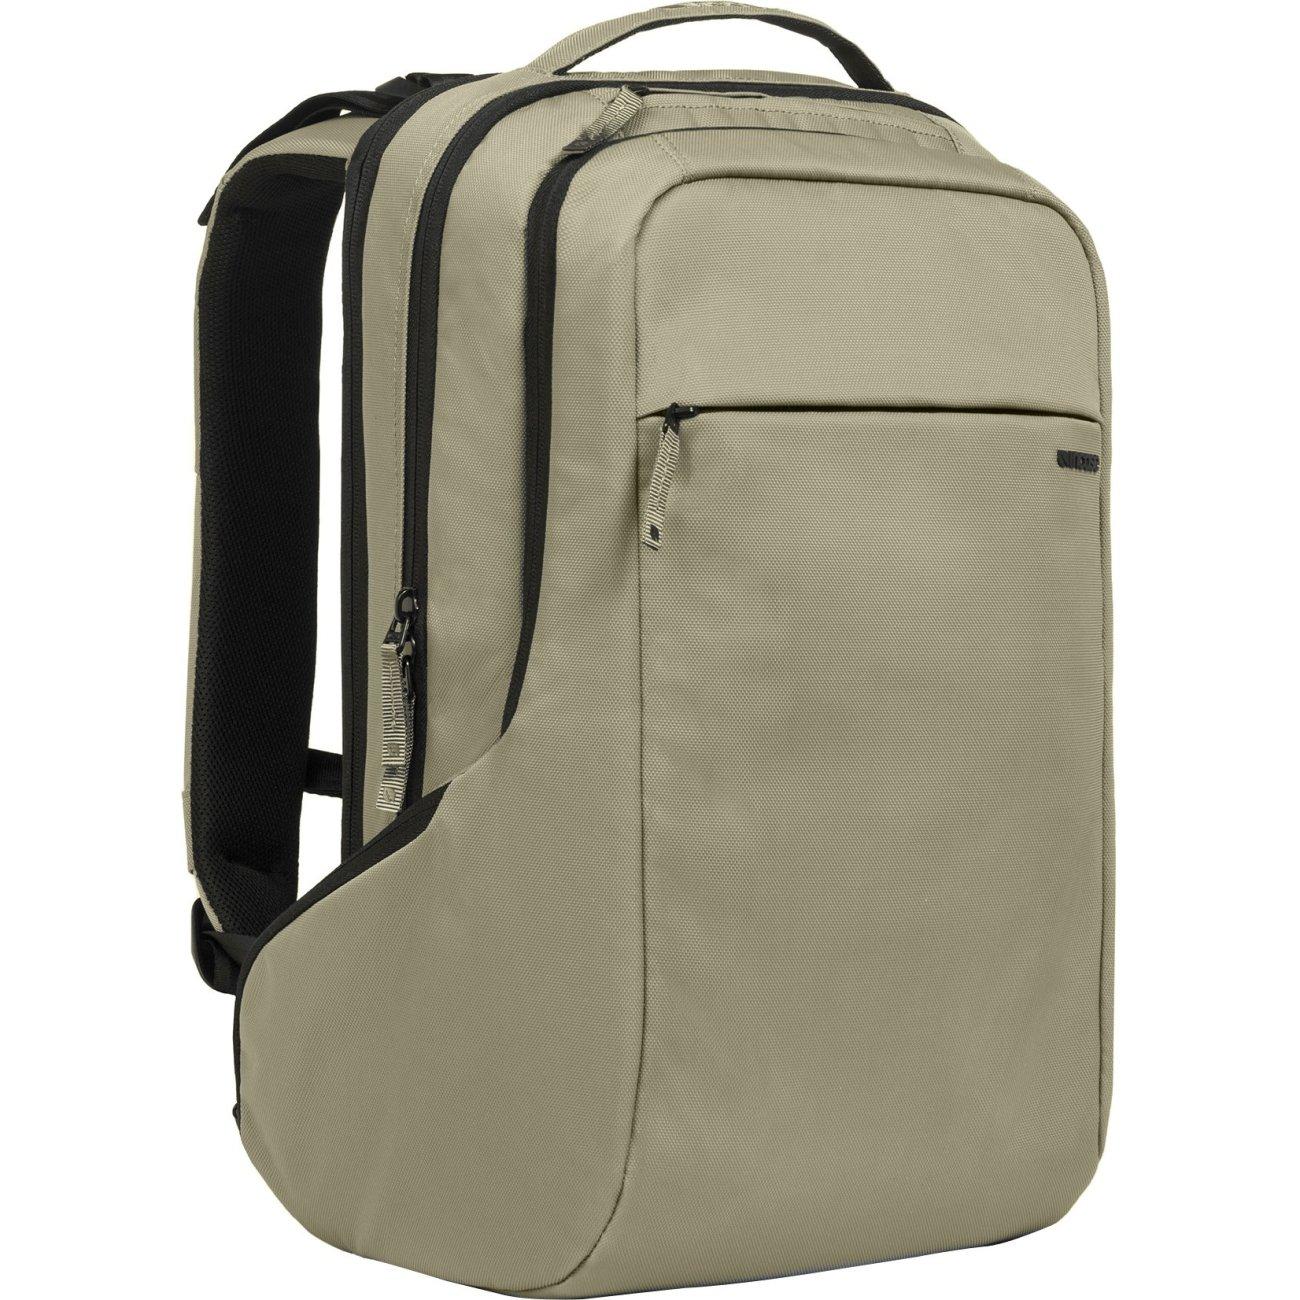 Incase Icon Pack Backpack | Moss Green/Black: Amazon.co.uk: Luggage